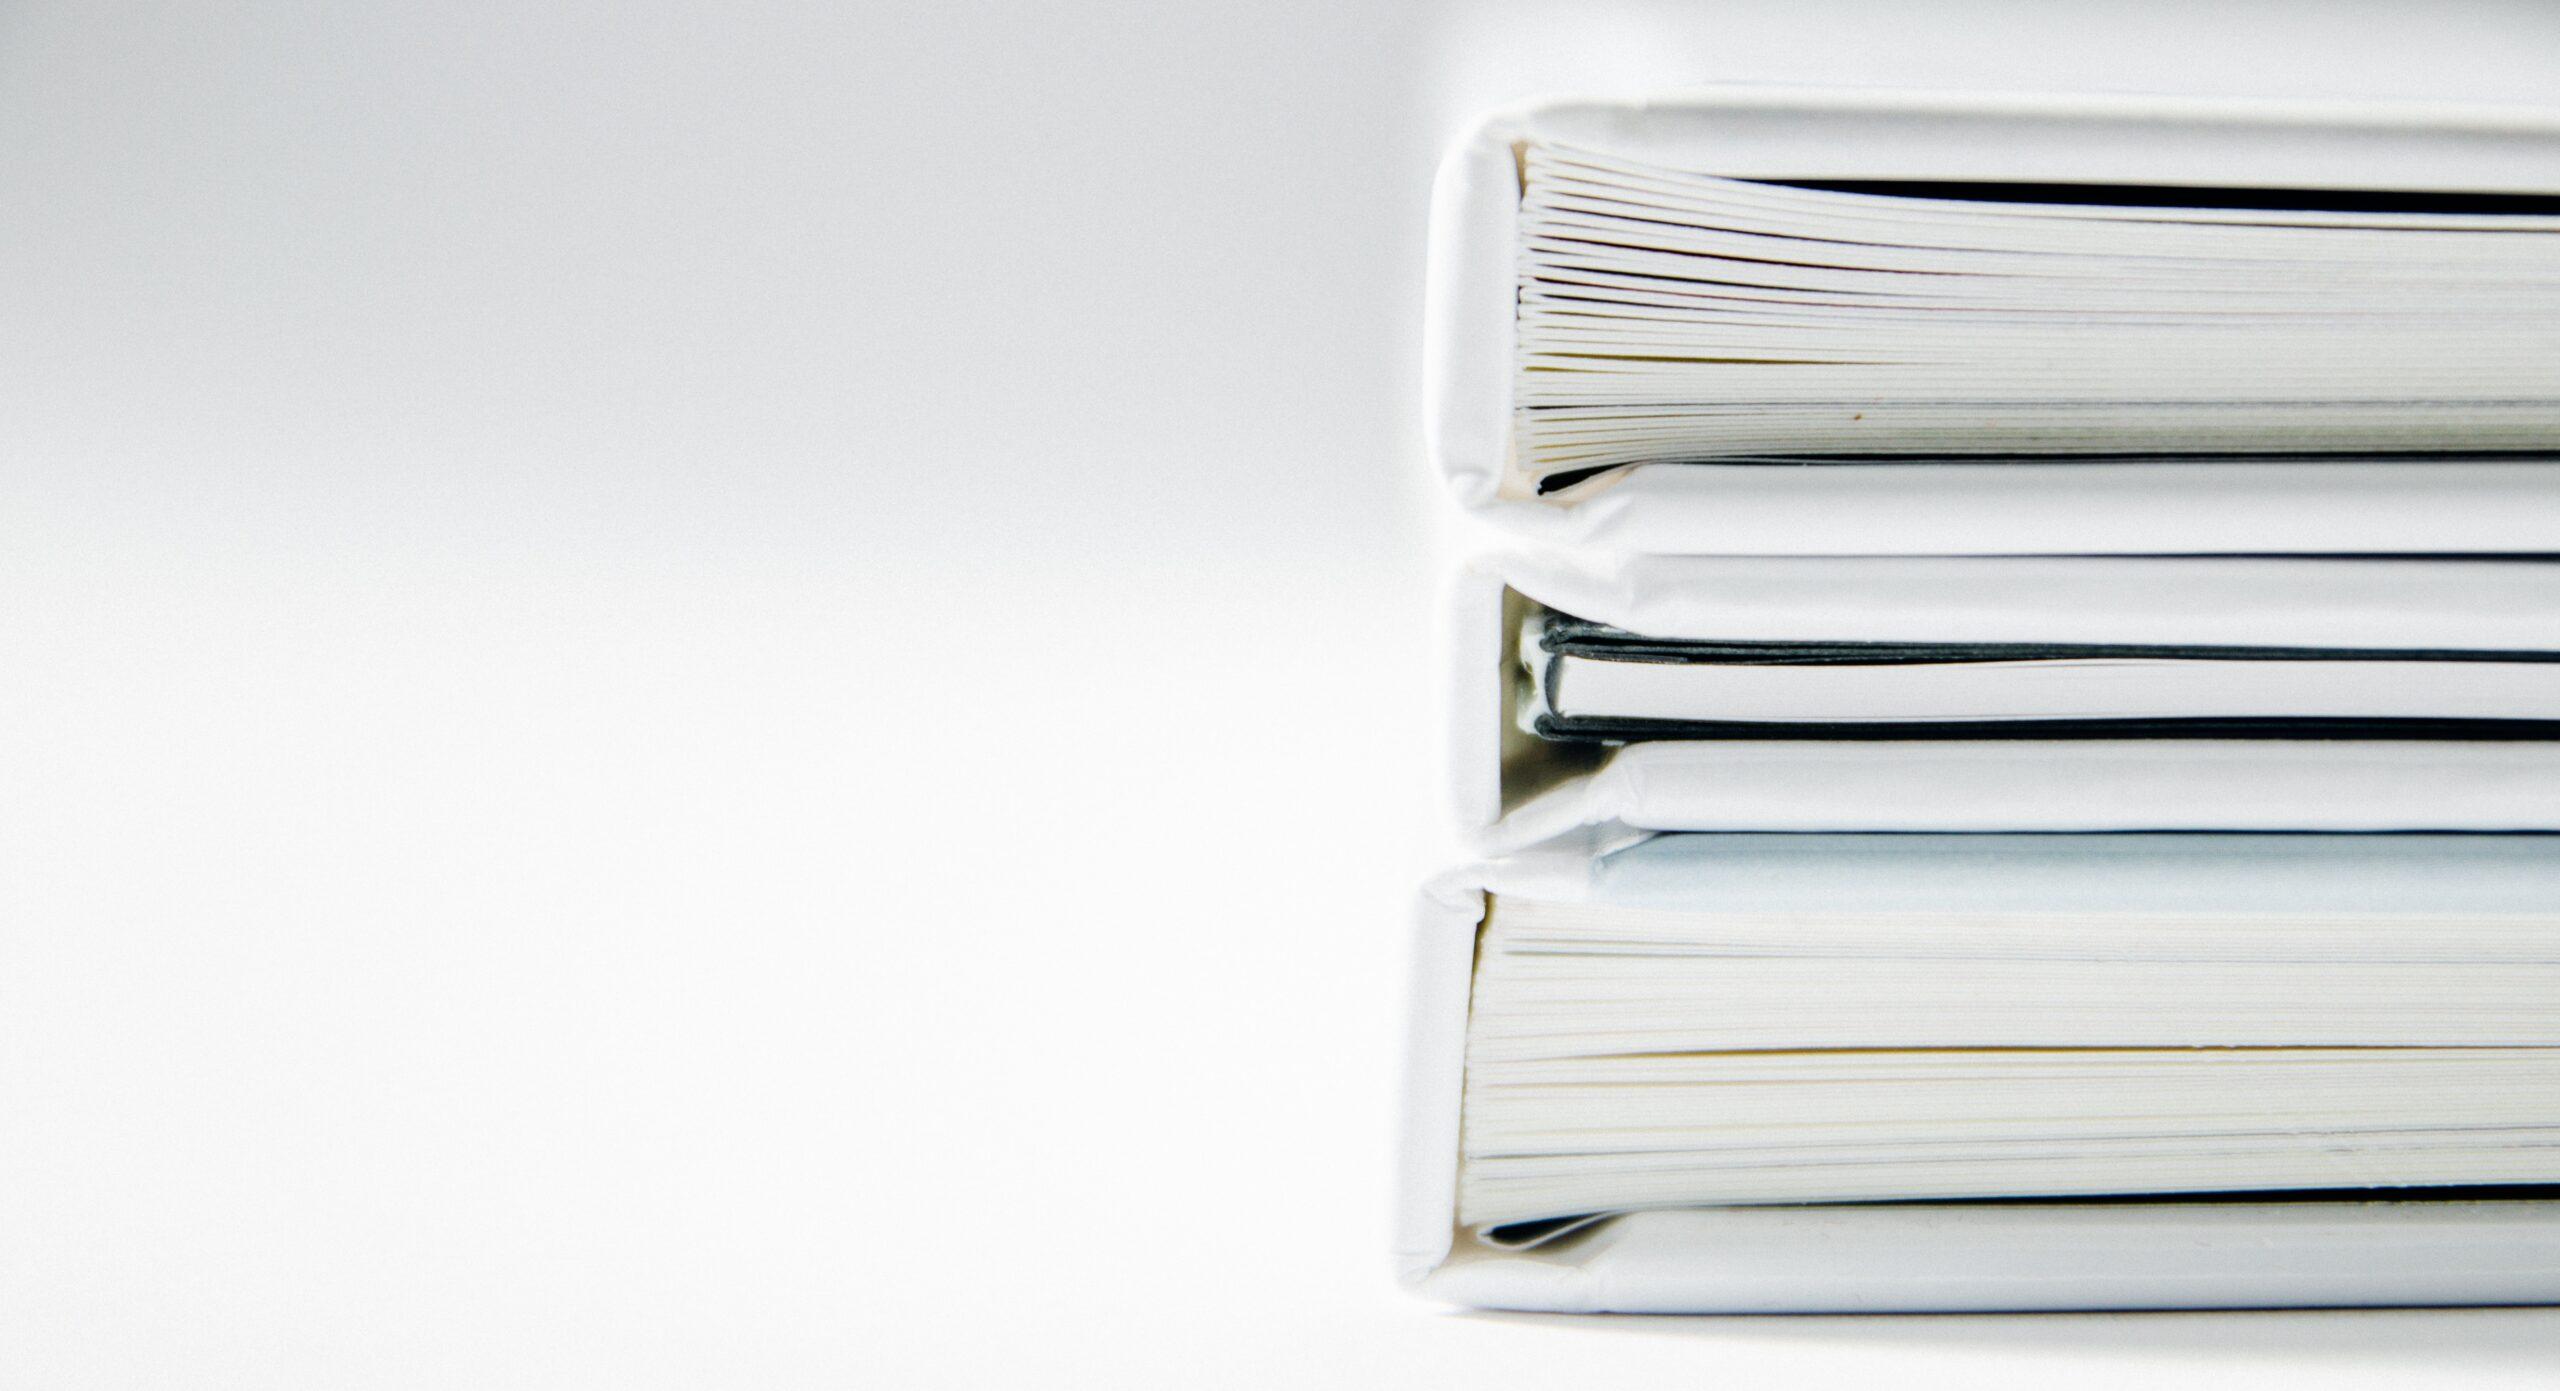 Ord talemåde udtryk betydning bog papir